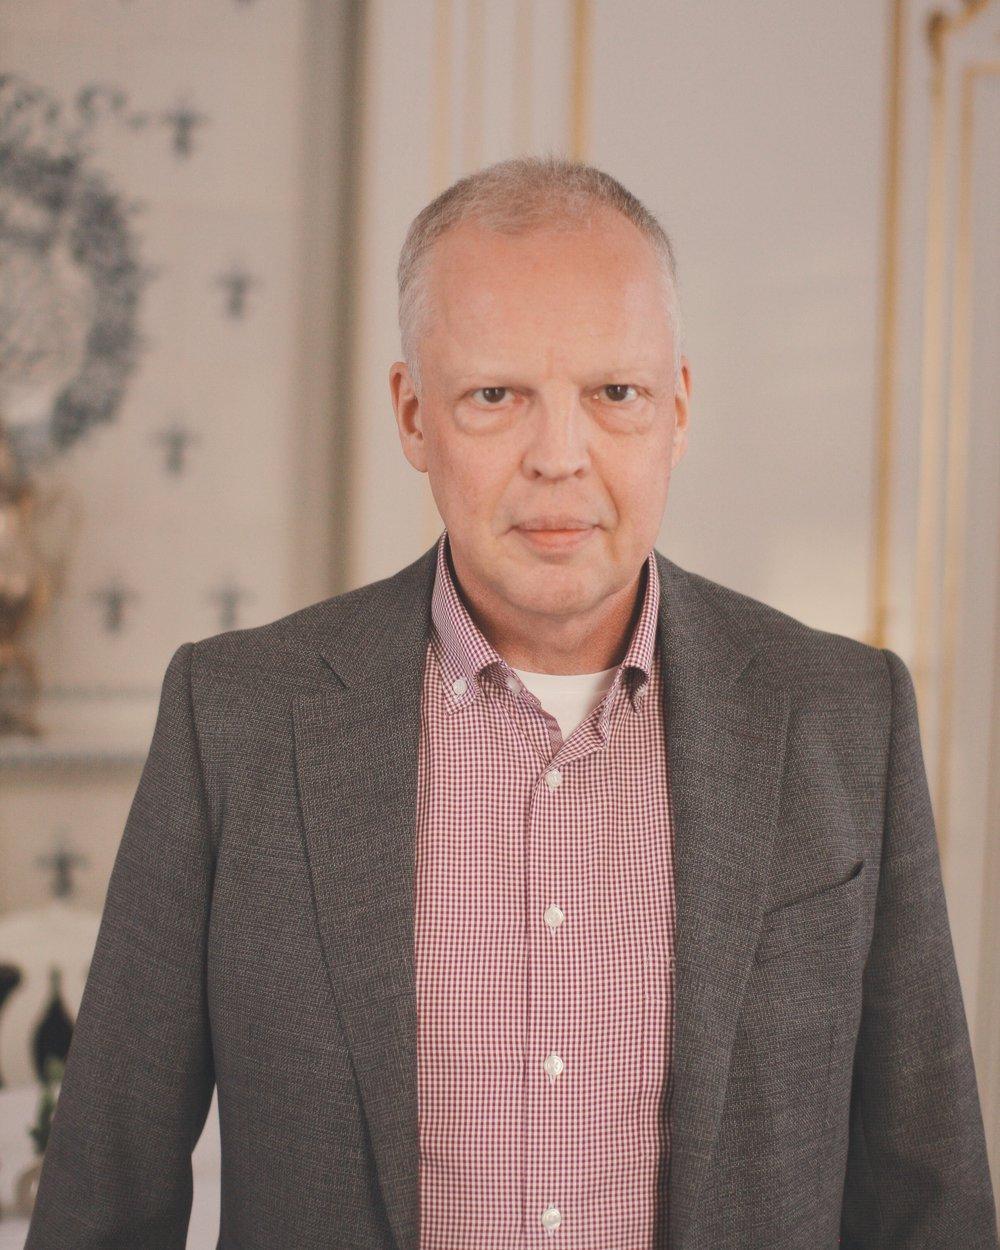 Jukka Mannermaa  +358 40-8449663   jukka.mannermaa@gaialeadership.com